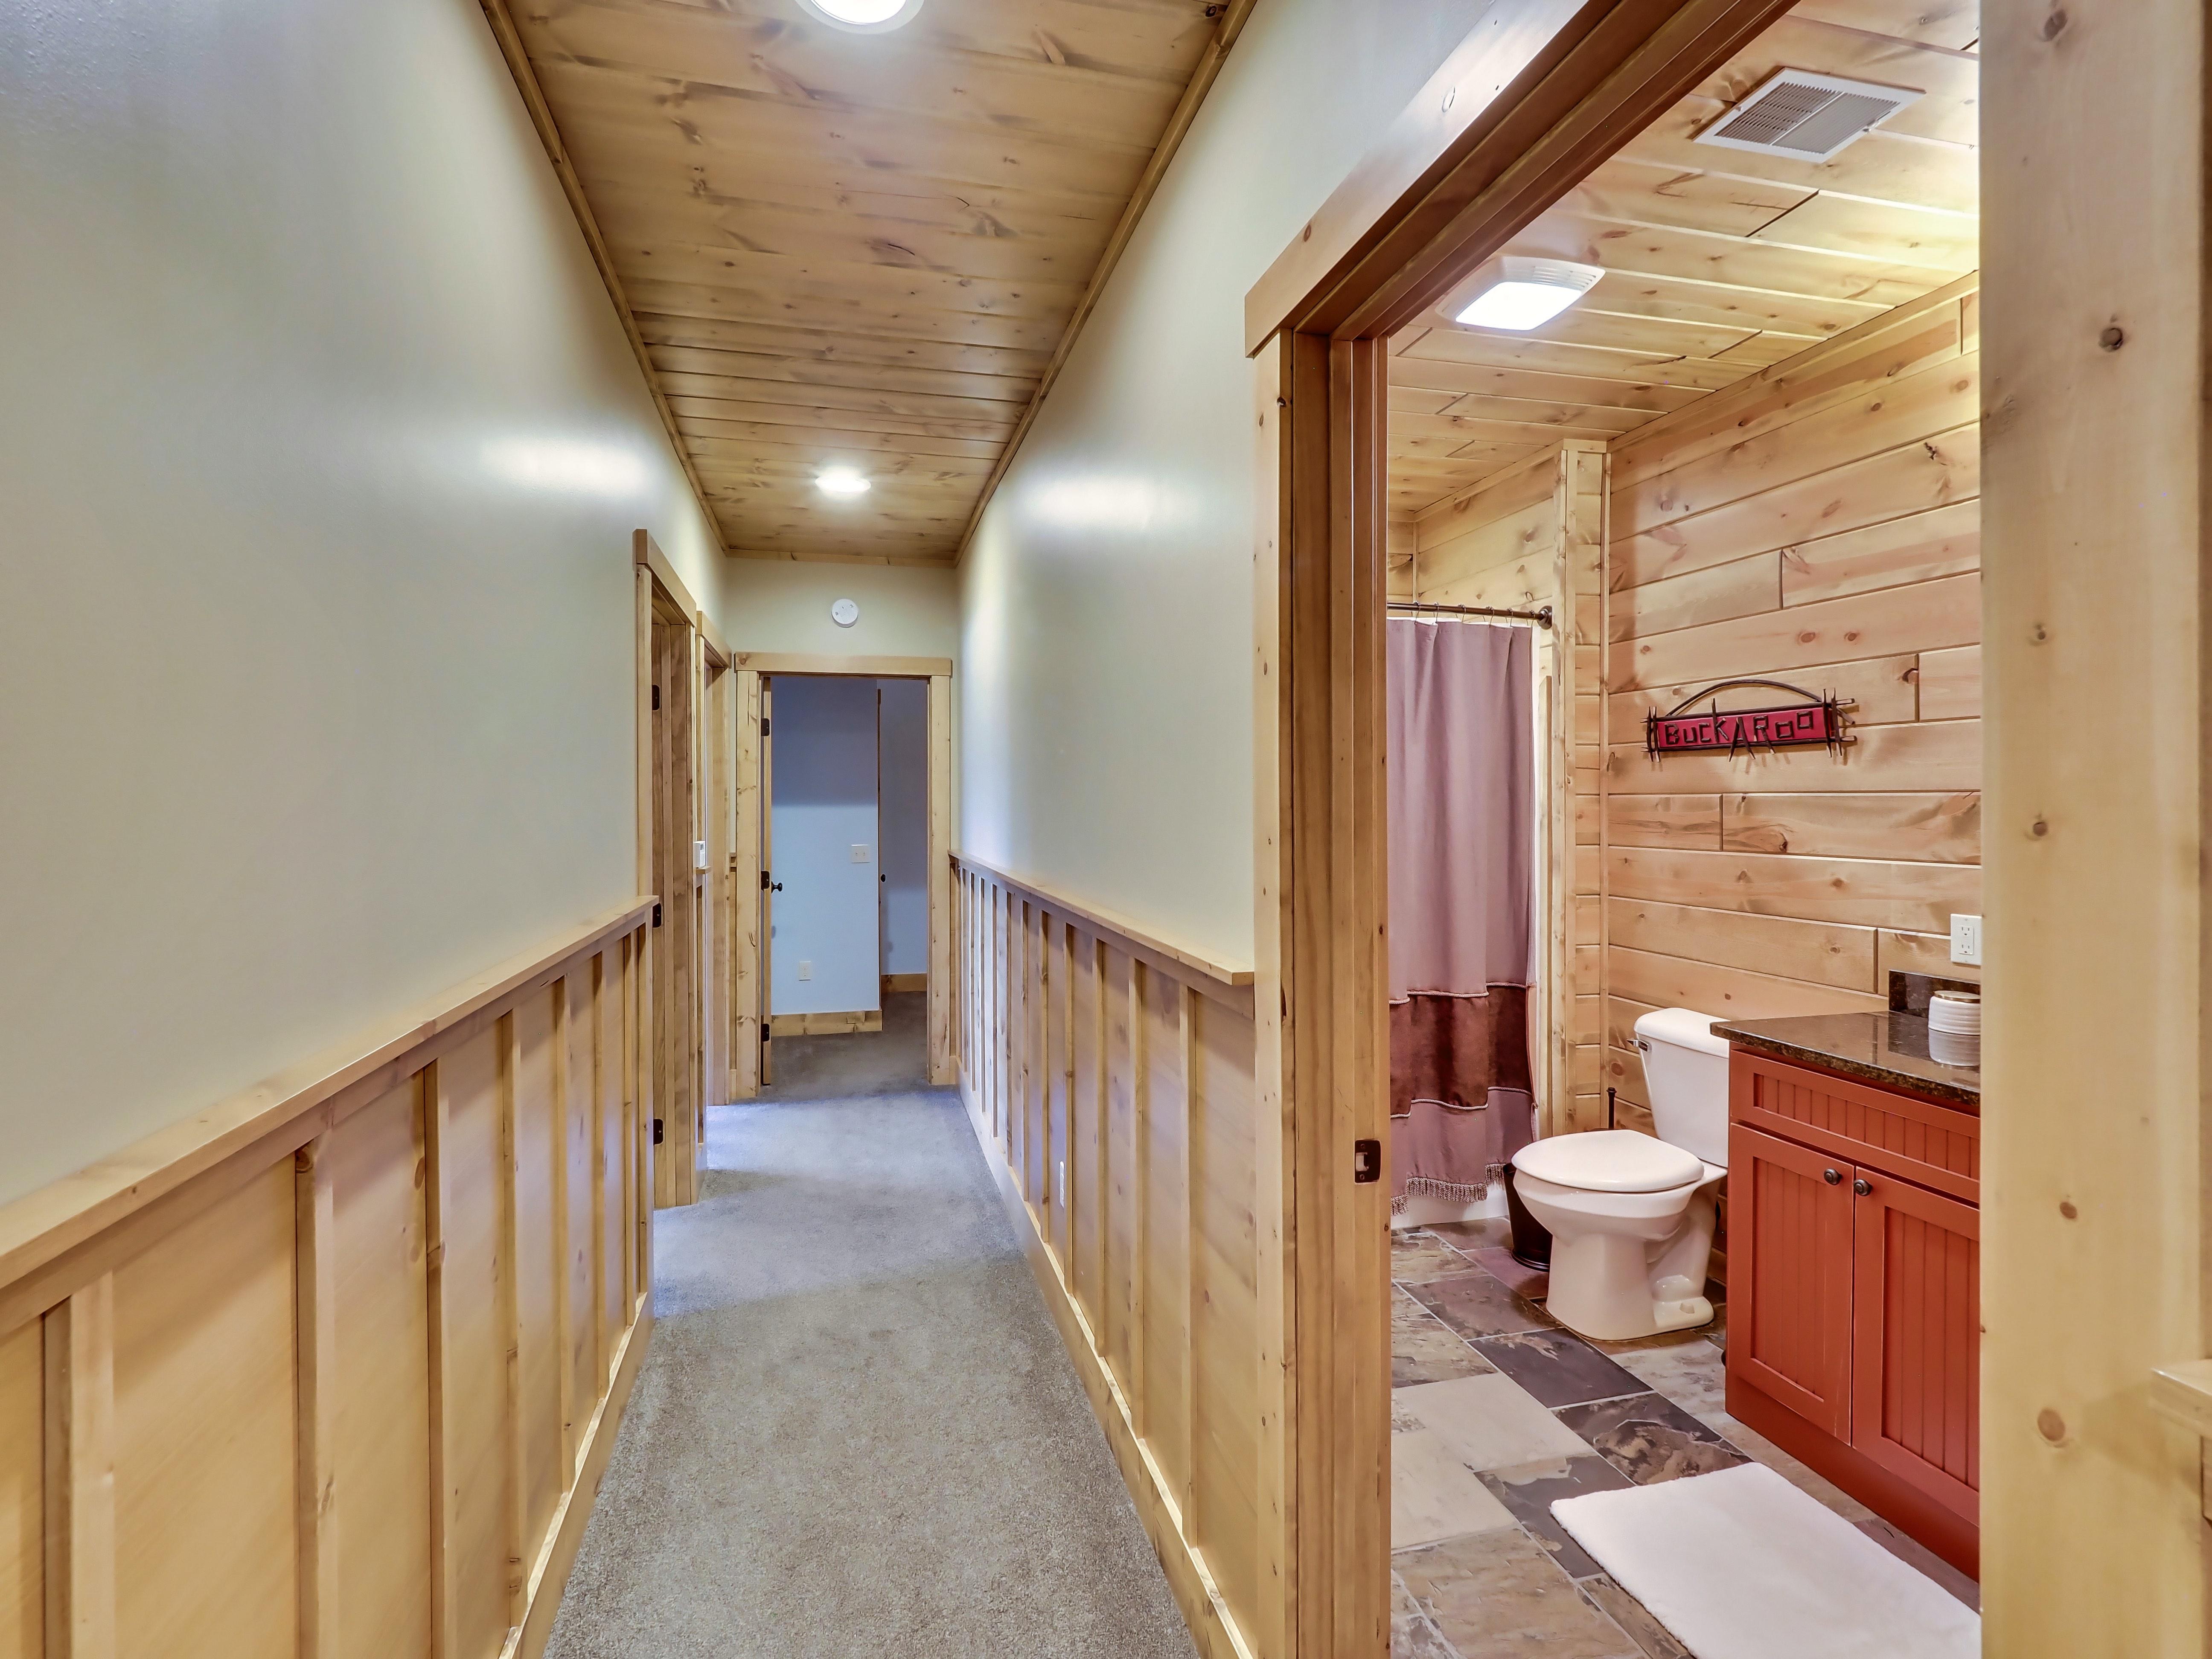 Downstairs Bedroom Hallway